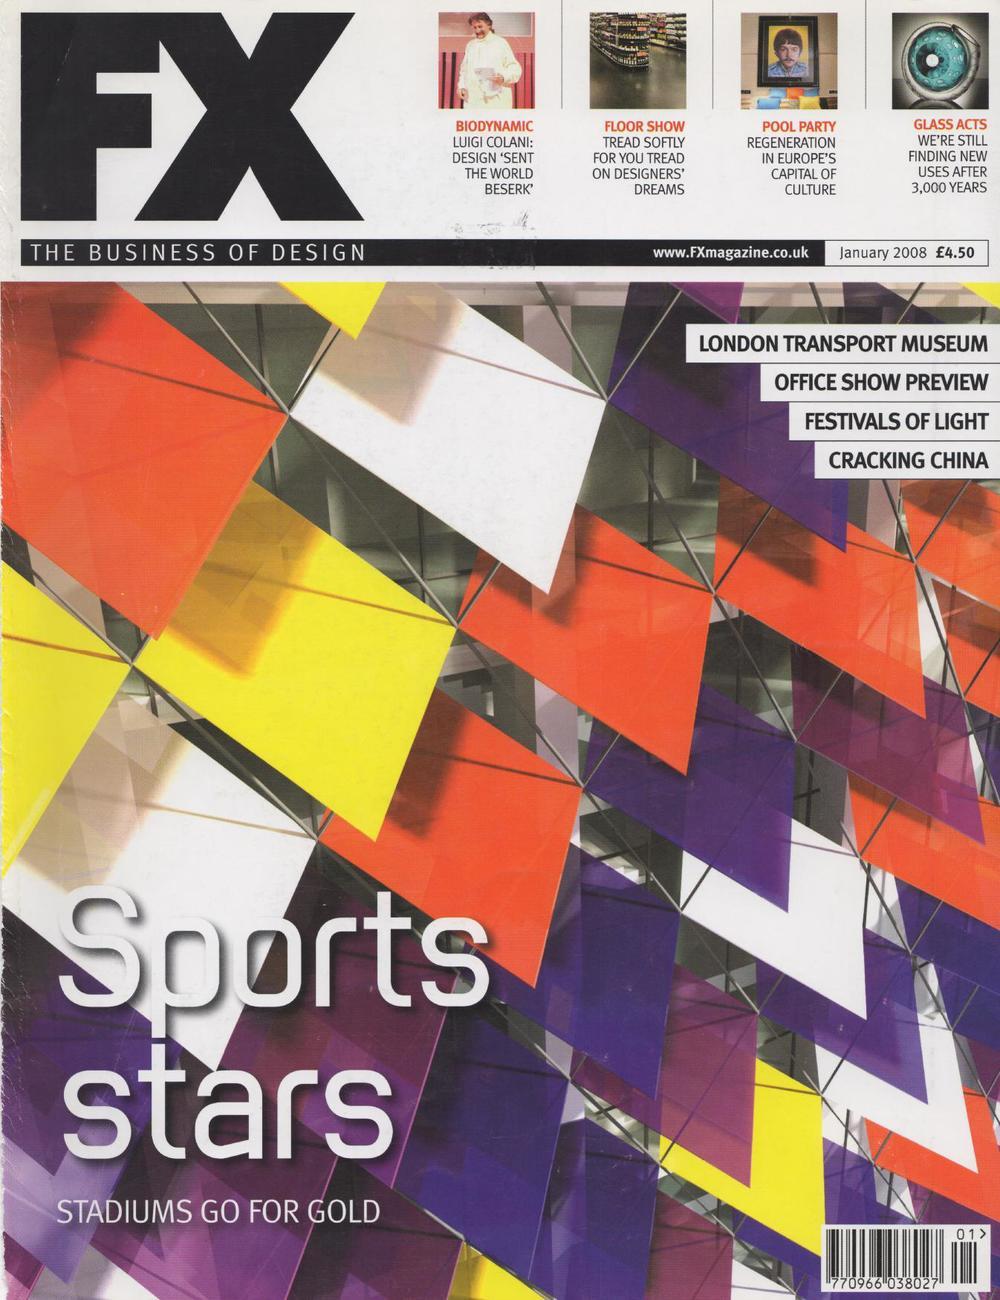 FxmagazineJan2008_000001.jpg